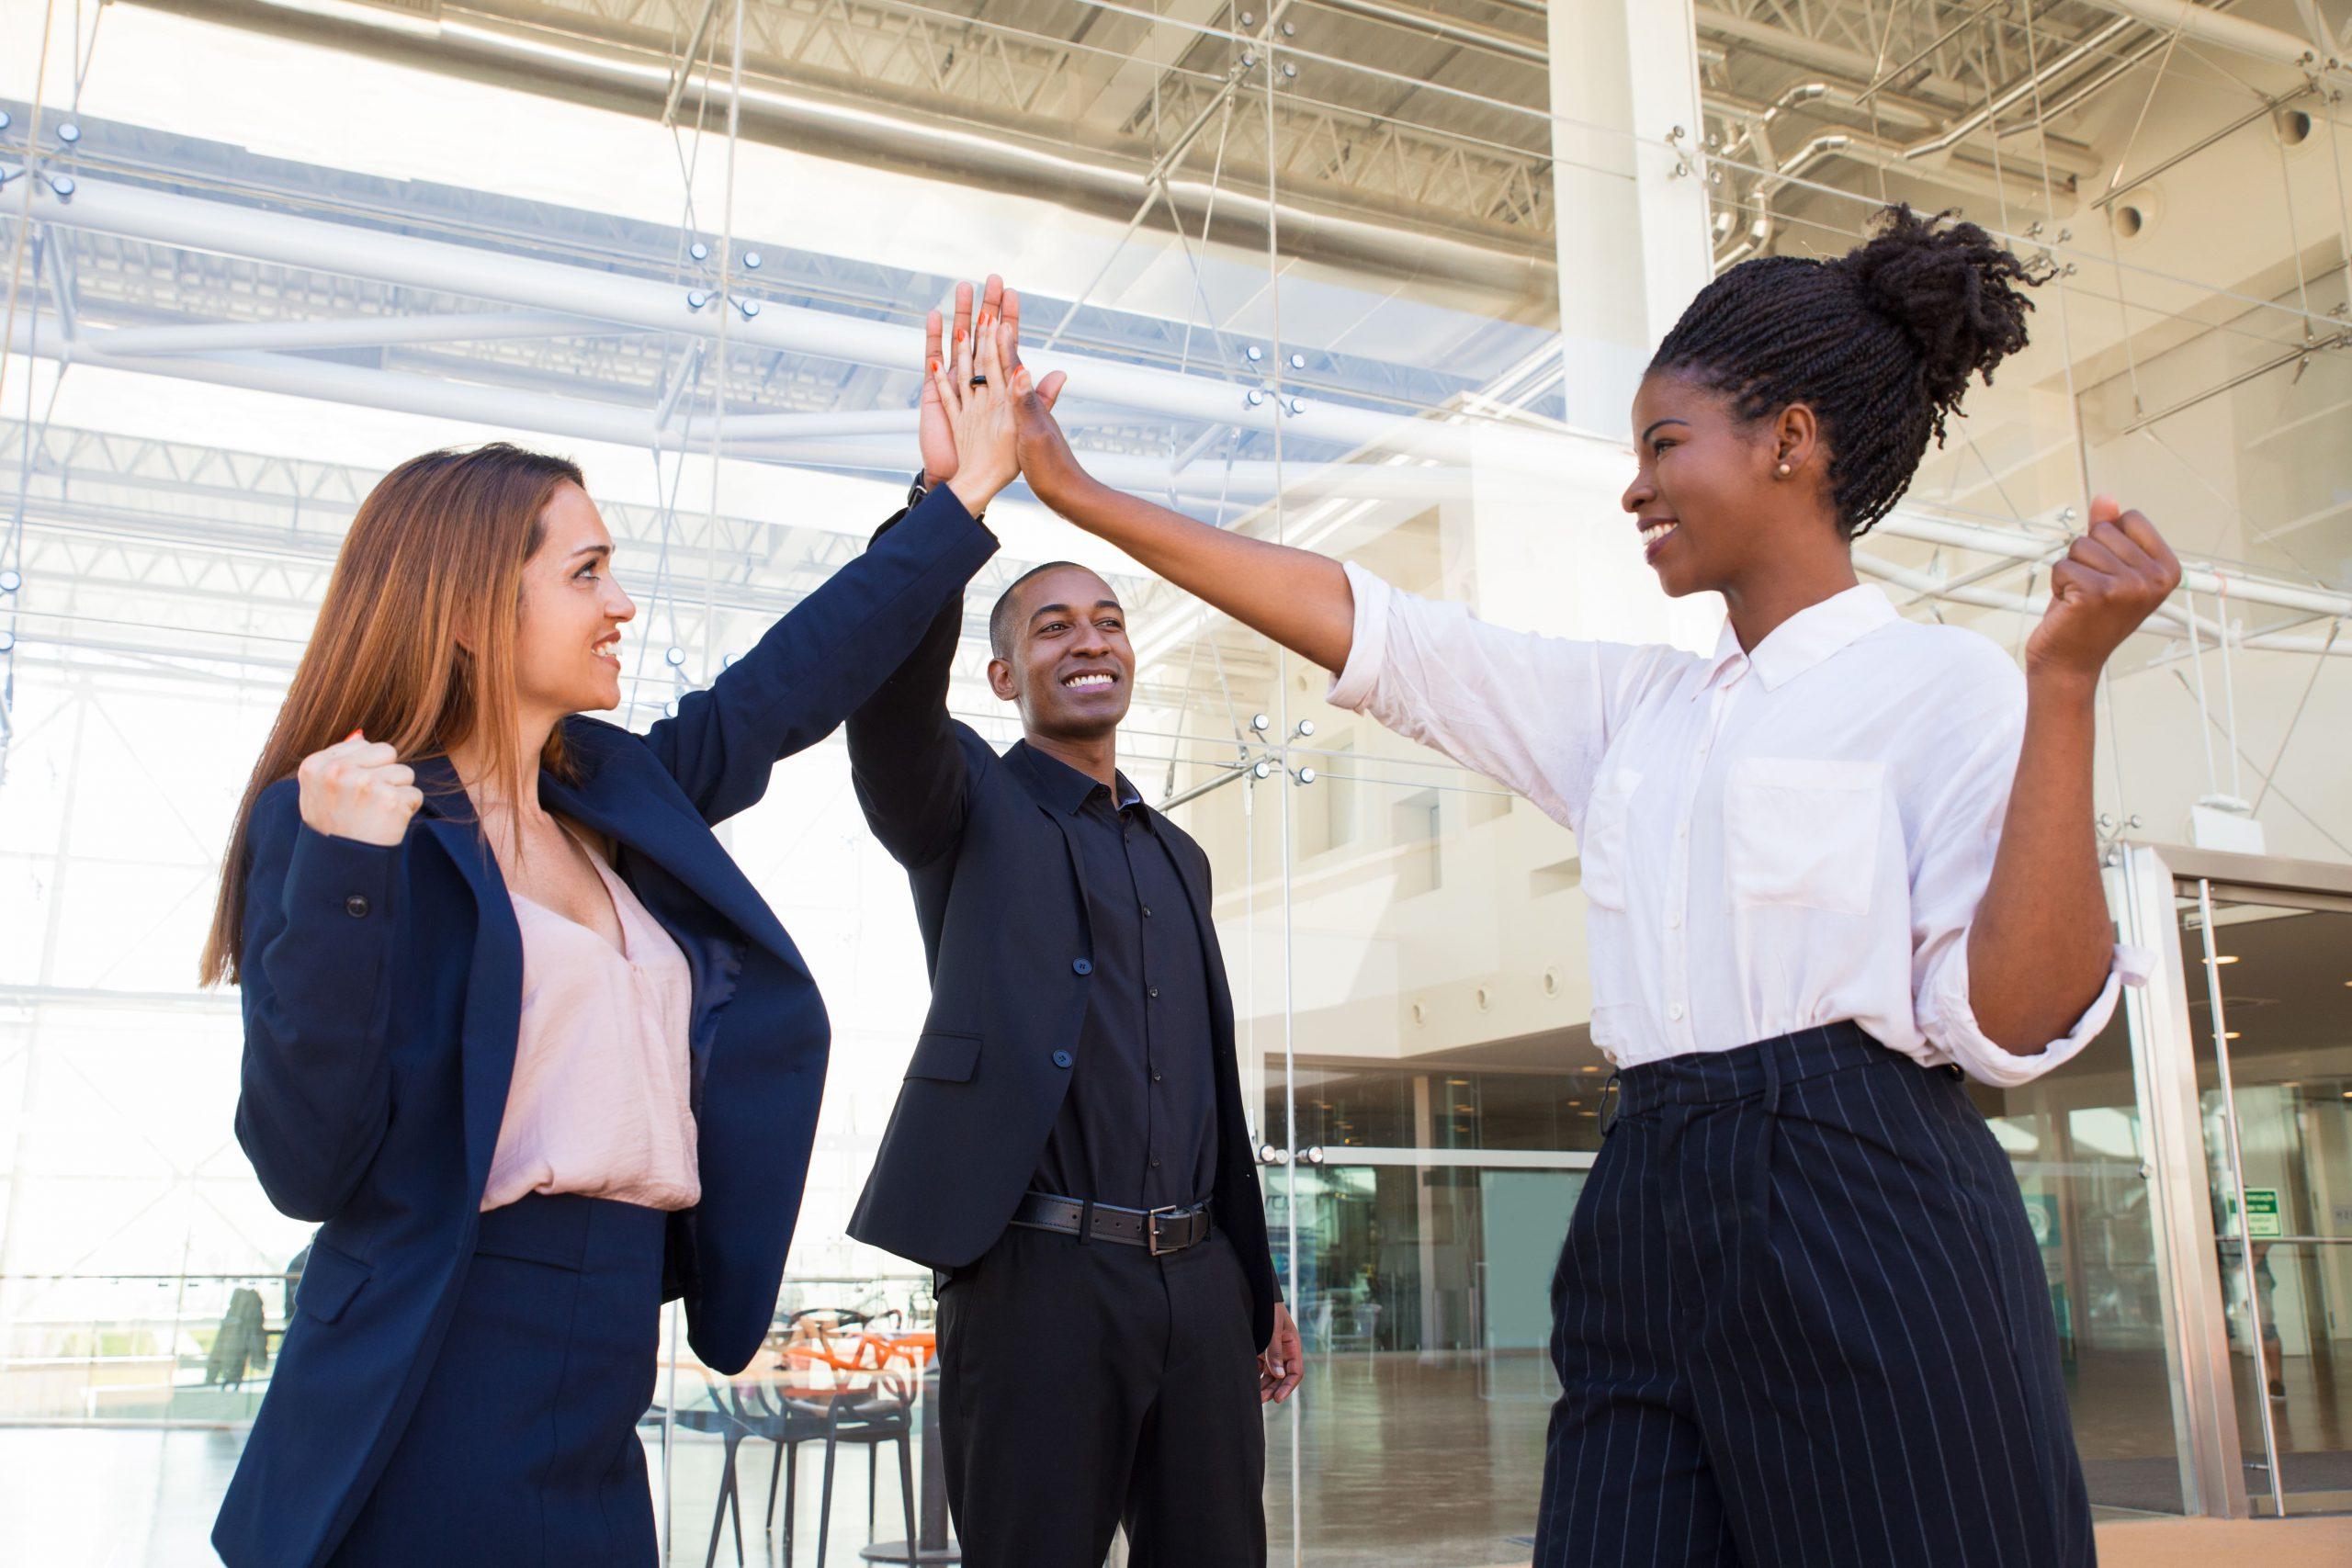 Employee development is essential for organizational growth